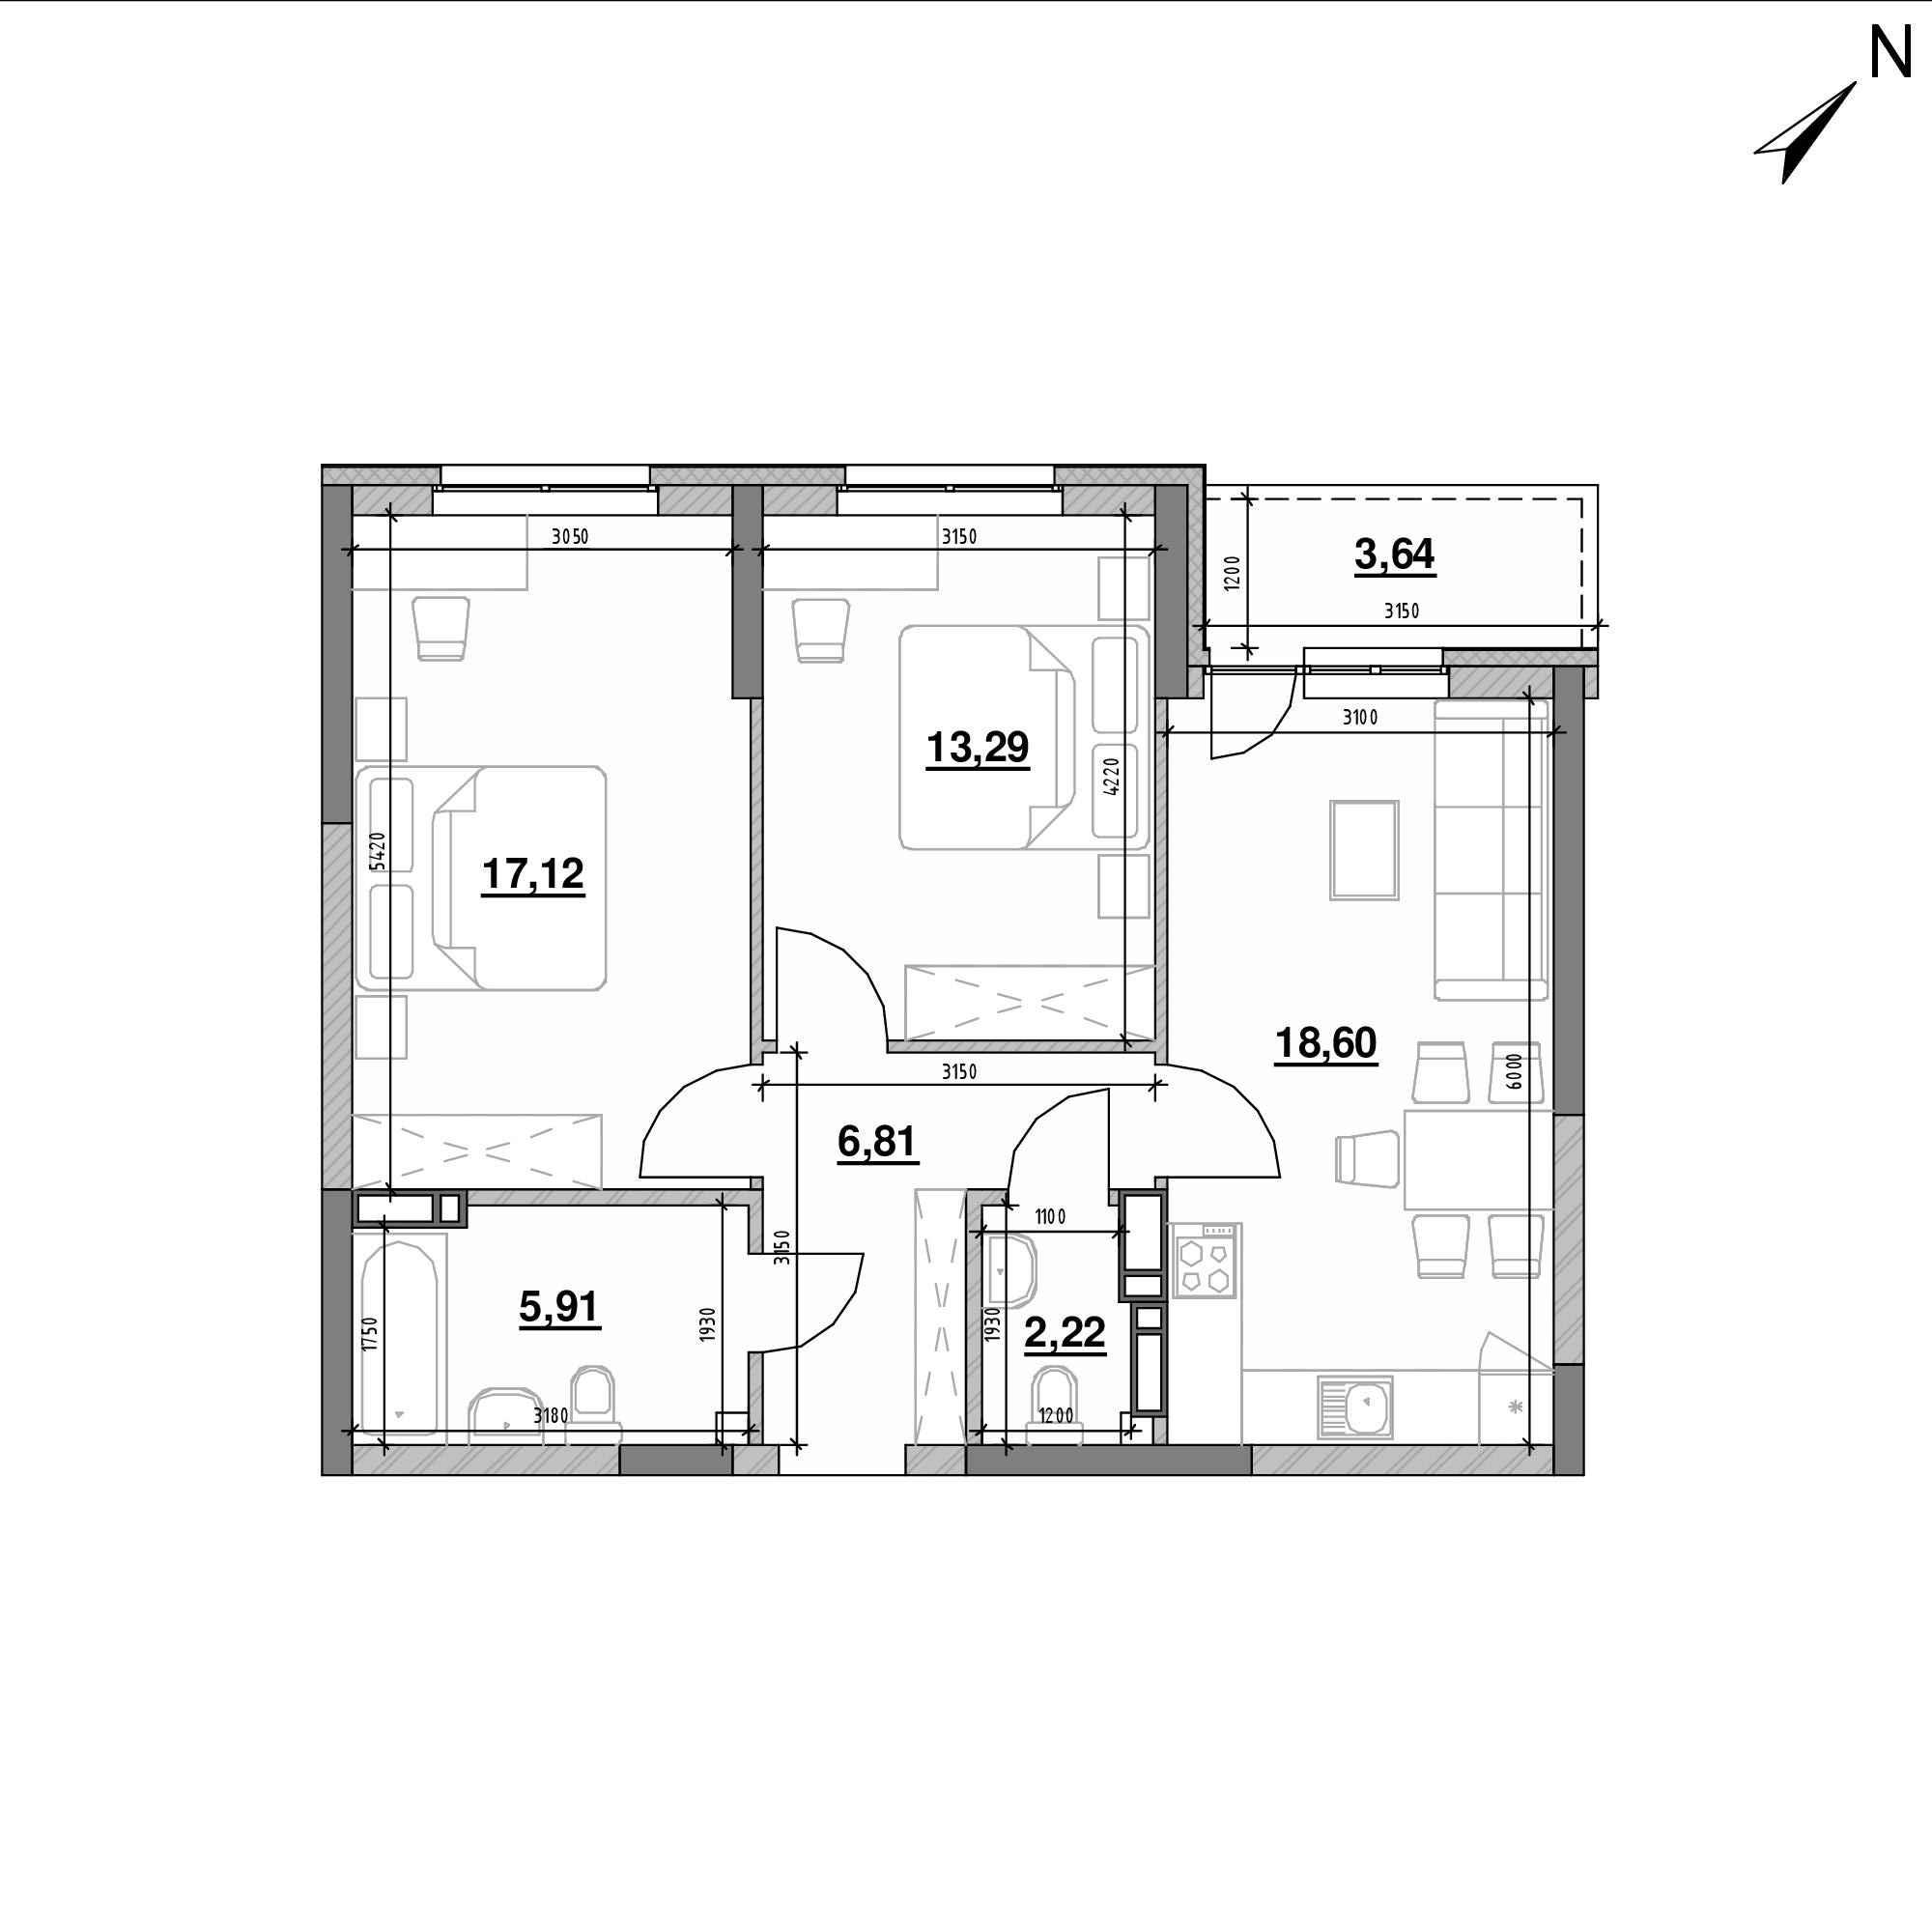 ЖК Оk'Land: планування 2-кімнатної квартири, №594, 67.59 м<sup>2</sup>